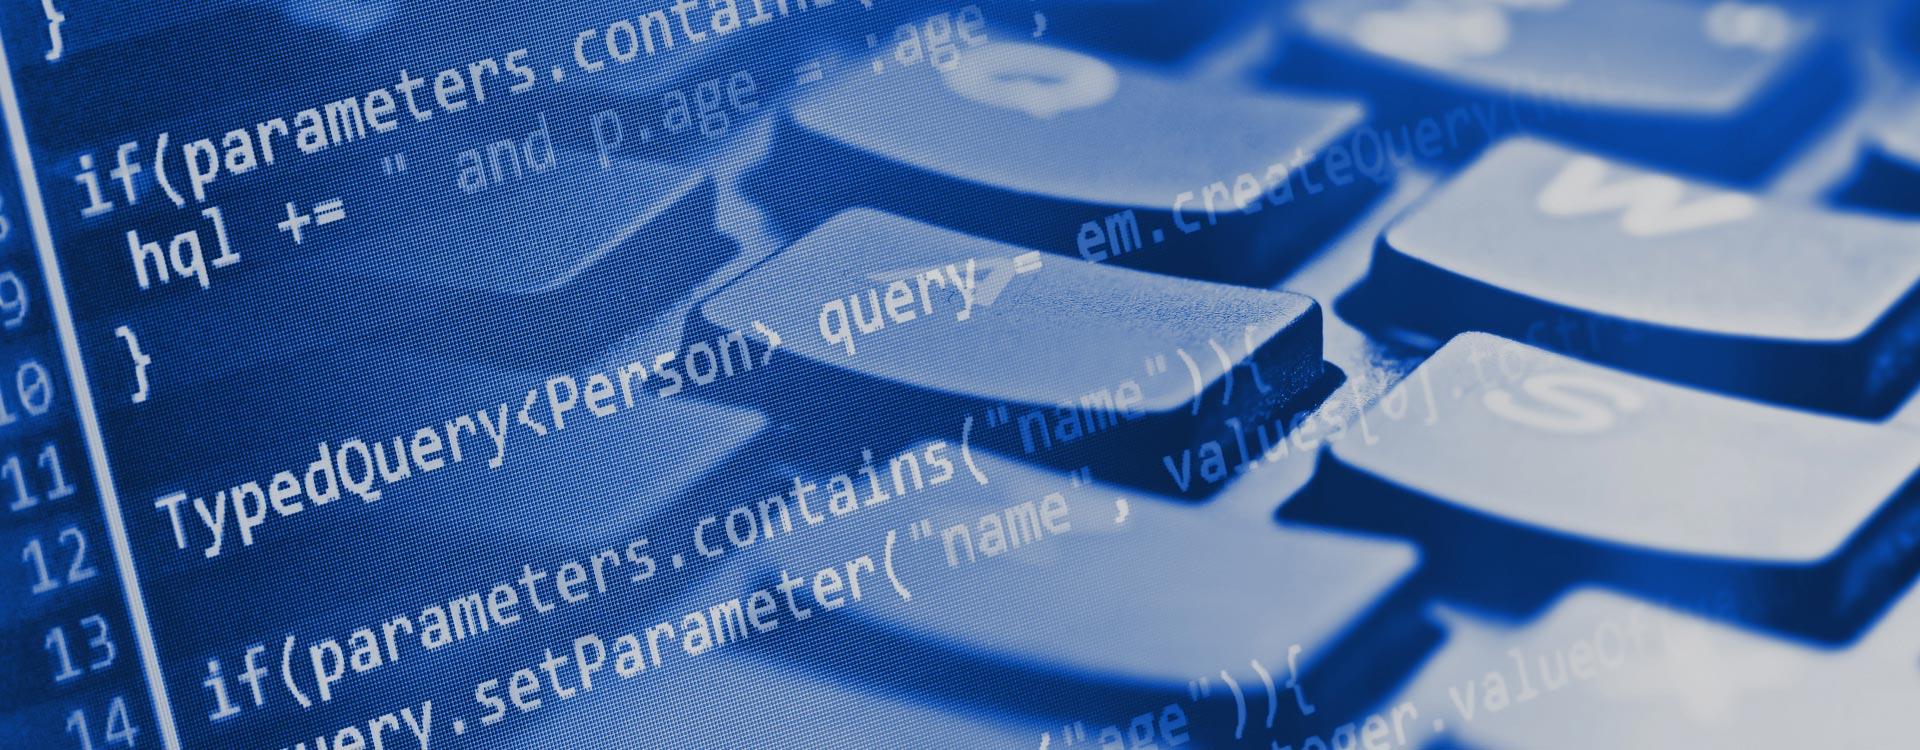 Comment Desinstaller Virus Online Notices Here de Google Chrome, Mozilla Firefox ou Internet Explorer